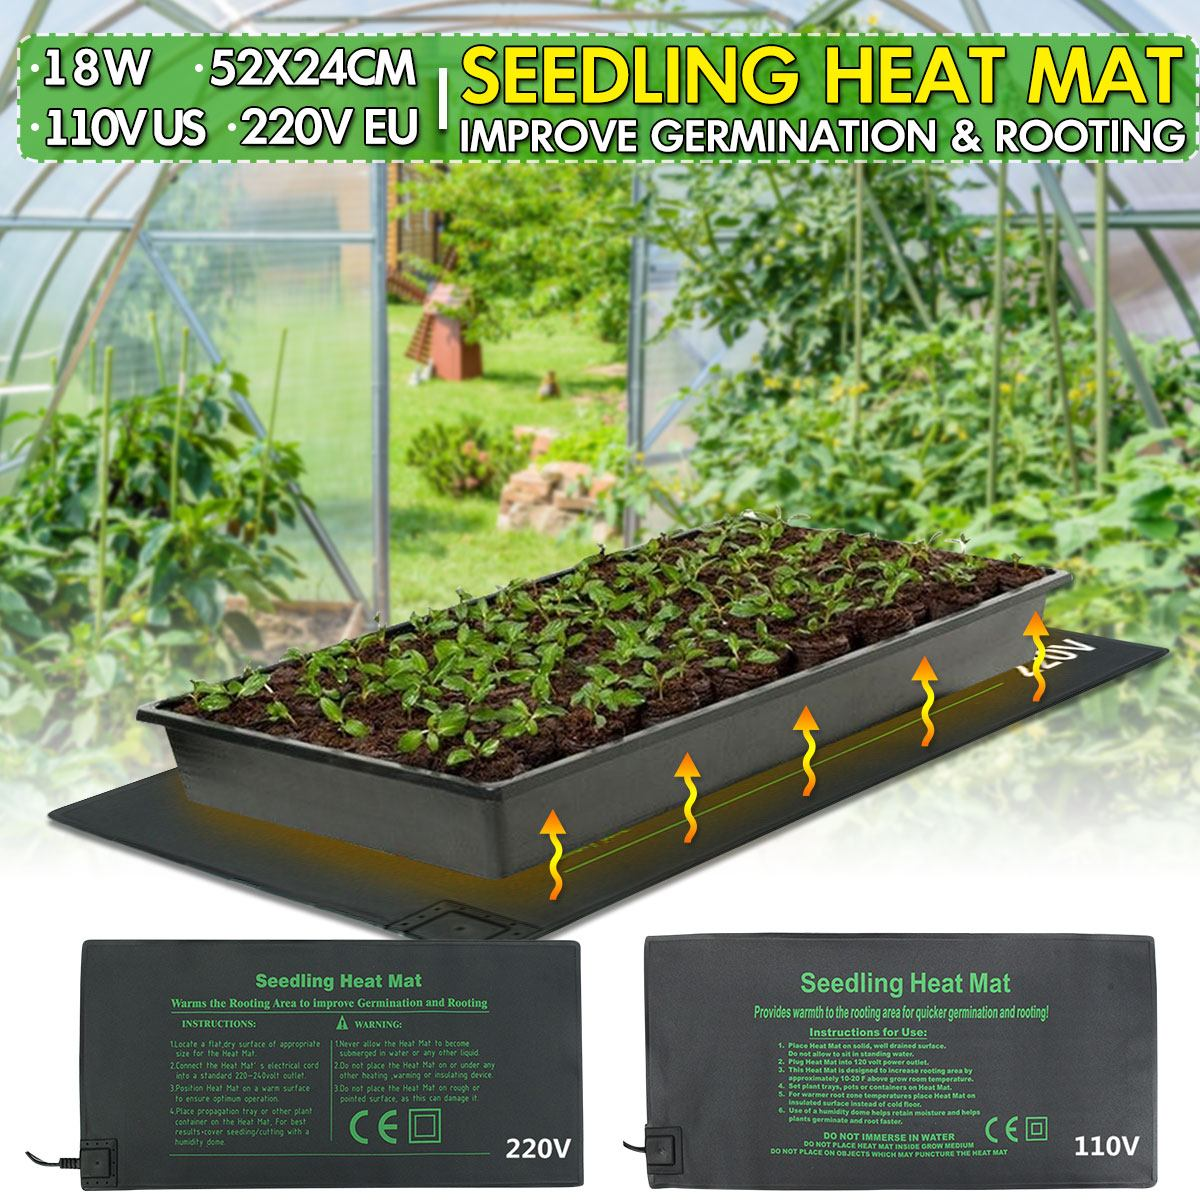 Seedling Heat Mat Plant Seed Germination Propagation Clone Starter Warm Pad Mat 24x52cm Vegetable Flowers Garden Tool Supplies